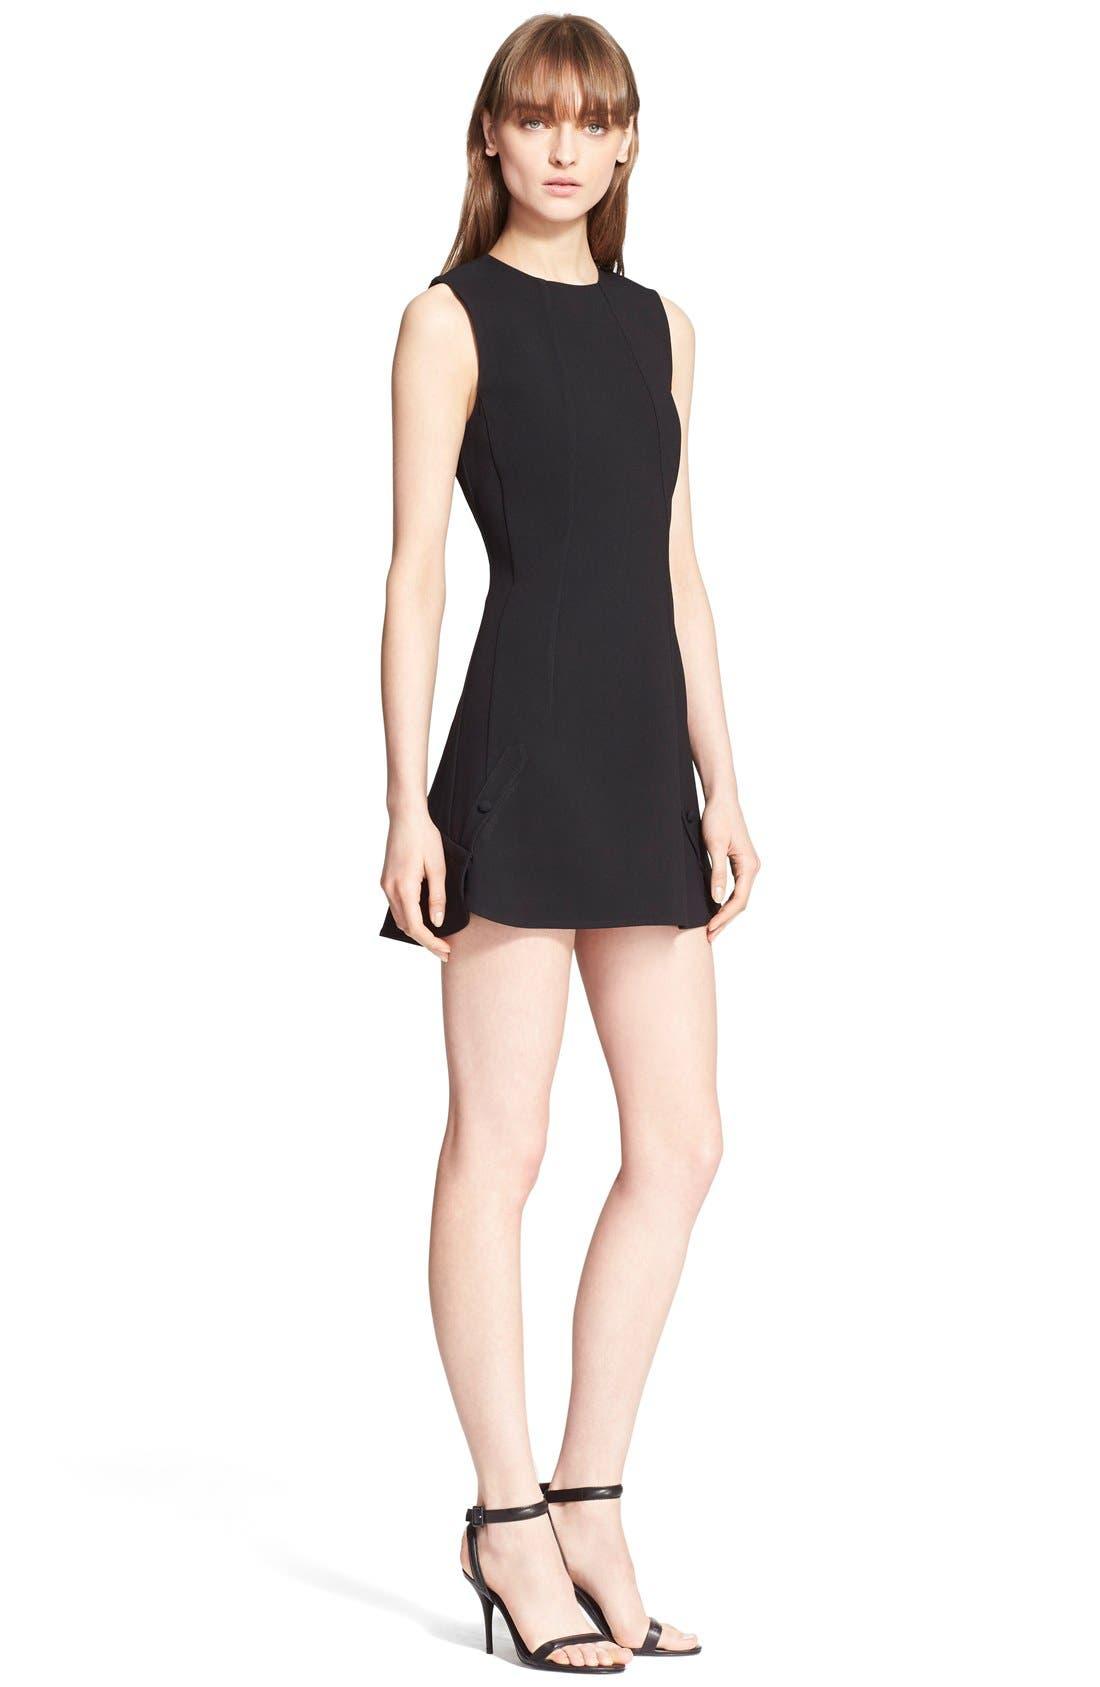 Alternate Image 1 Selected - Alexander Wang Sleeveless Crepe Dress